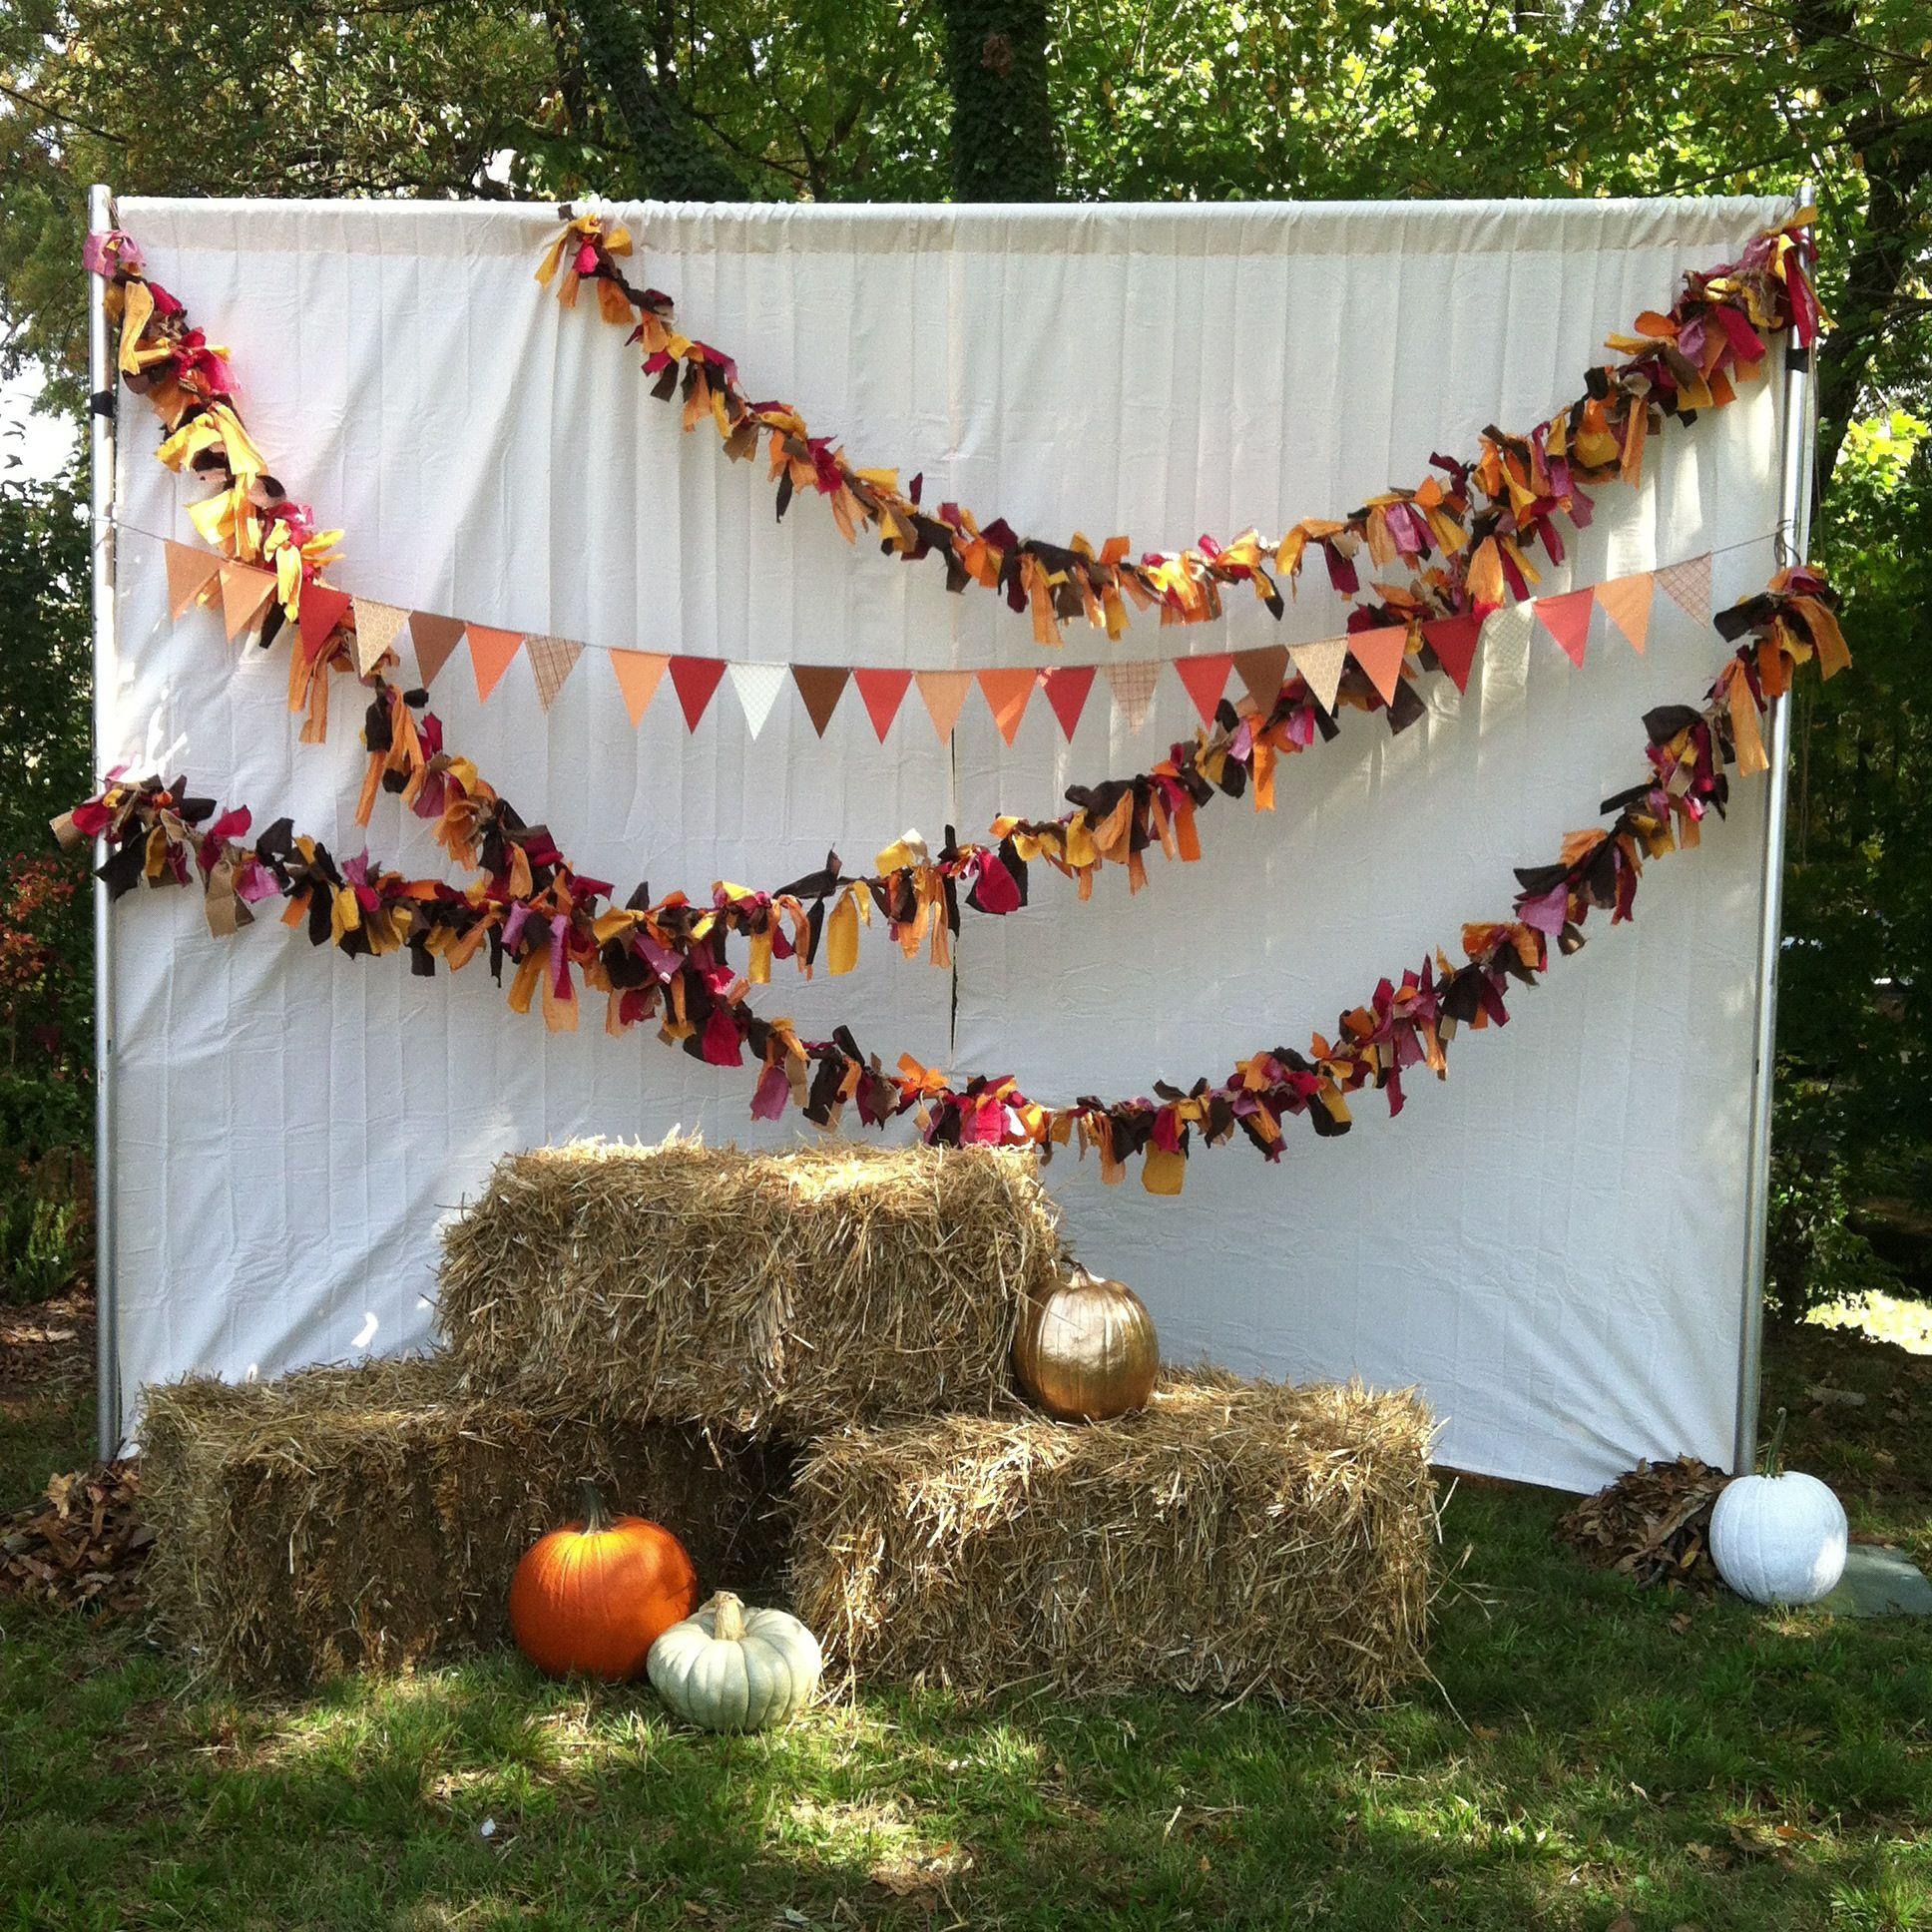 Fall Festival Games